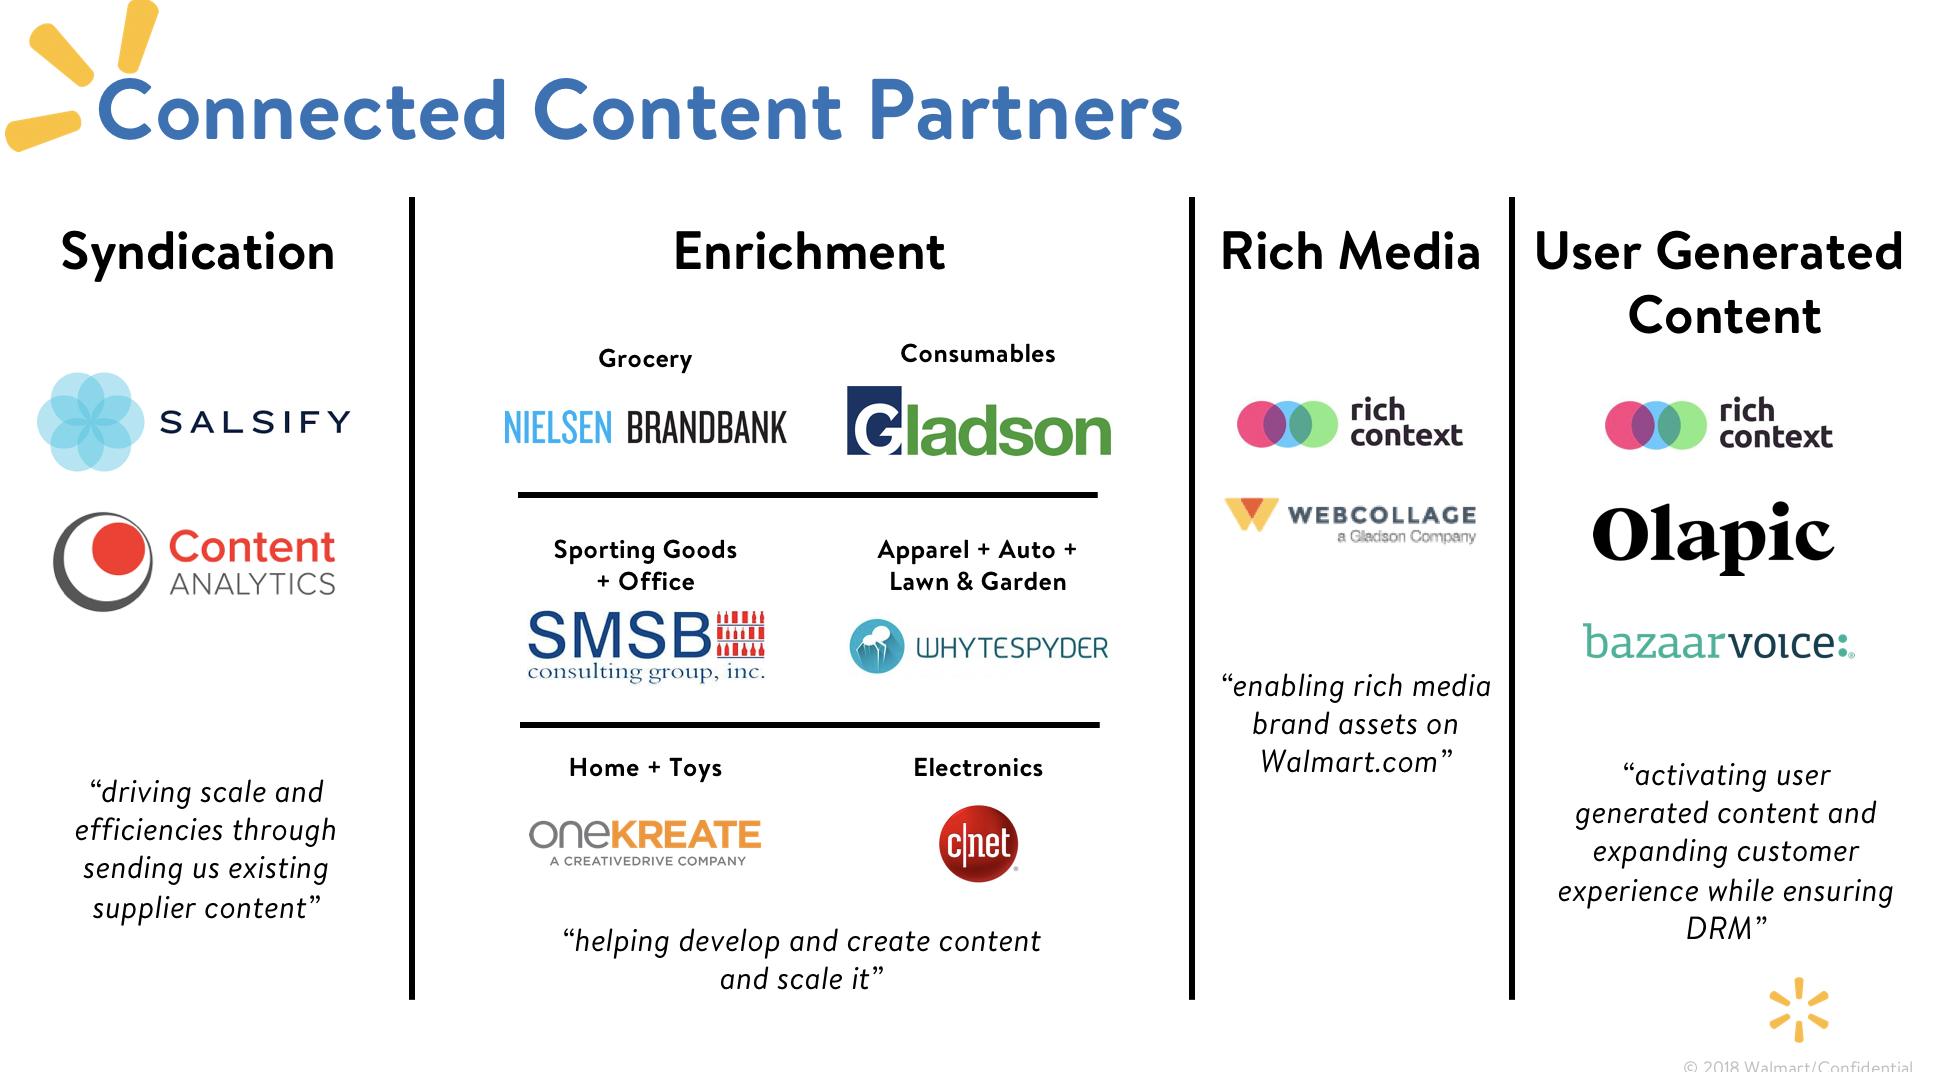 Walmart's Connected Content Partners